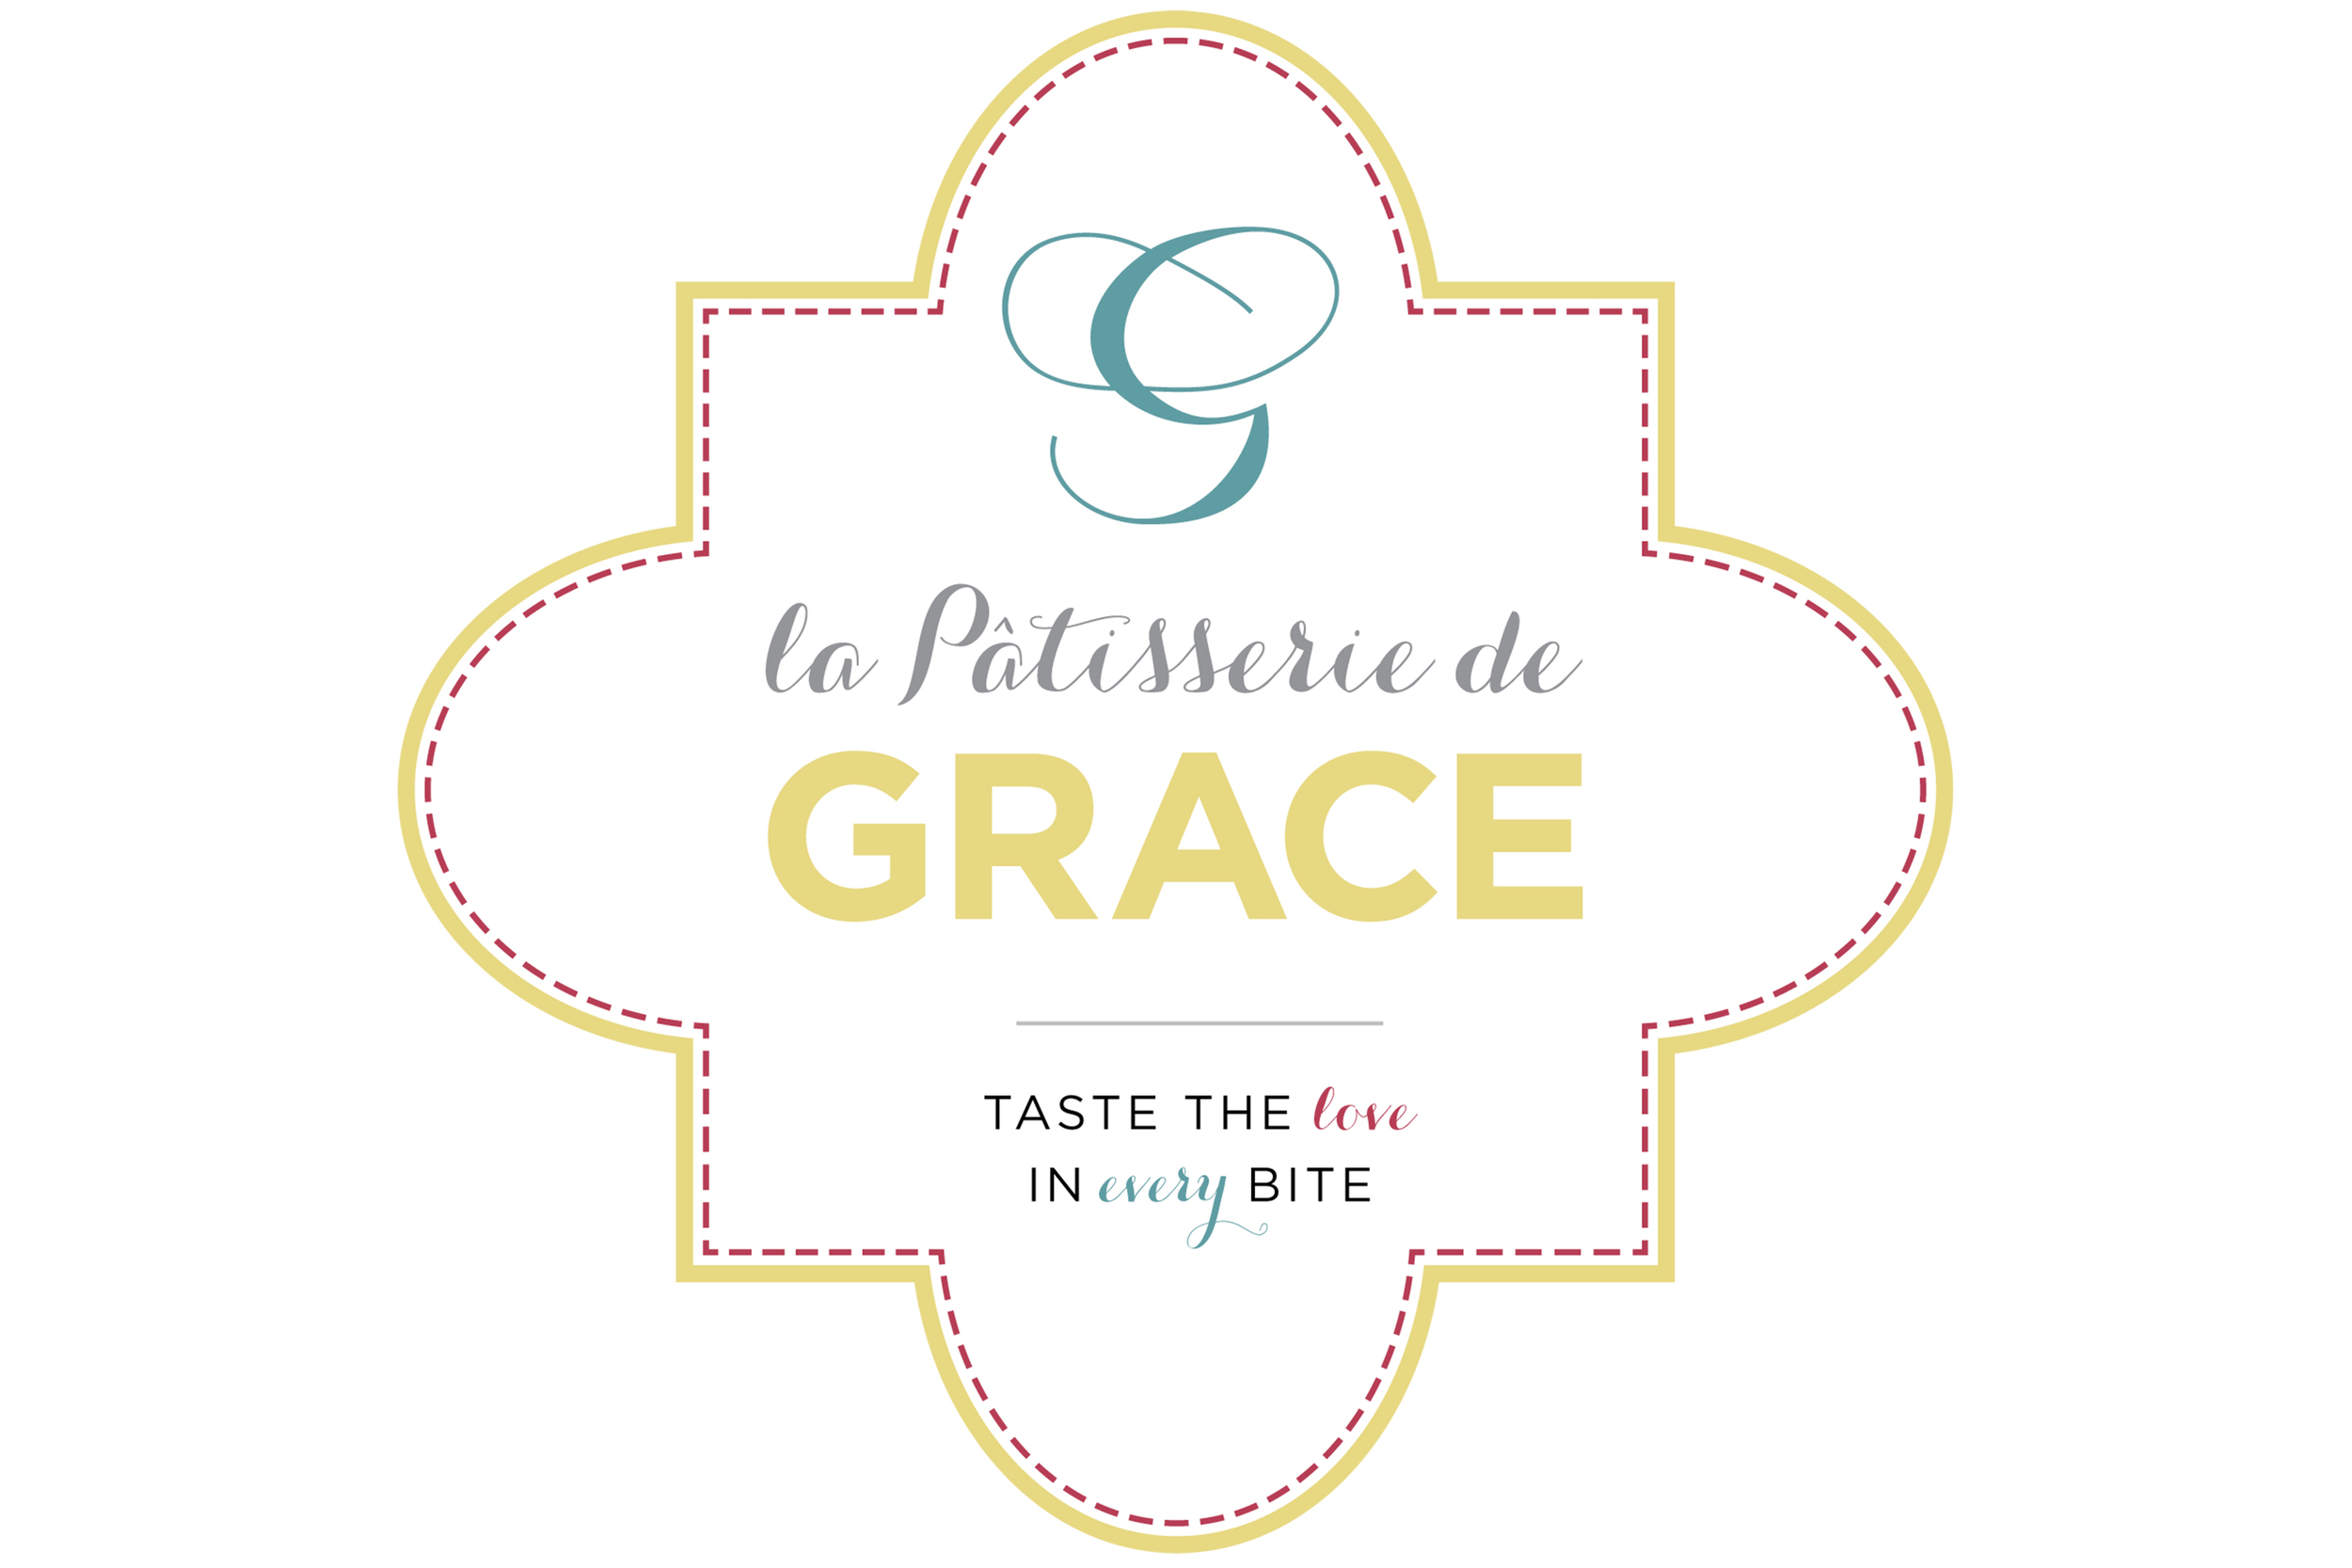 New branding,logo and tagline for La Patisserie de Grace, taste the love in every bite.